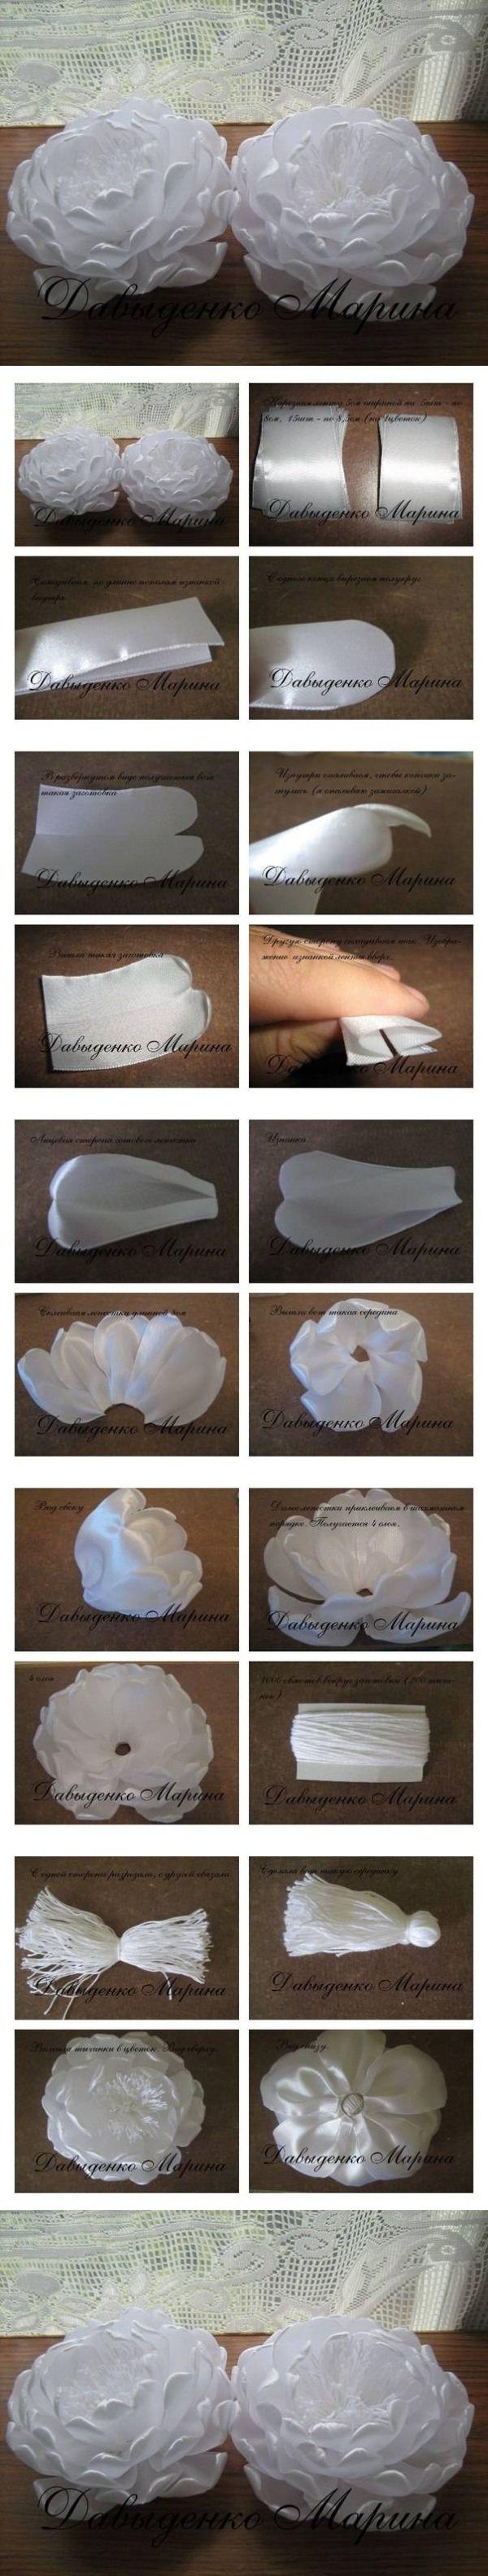 DIY Beautiful White Flower Brooch DIY Beautiful White Flower Brooch by diyforever